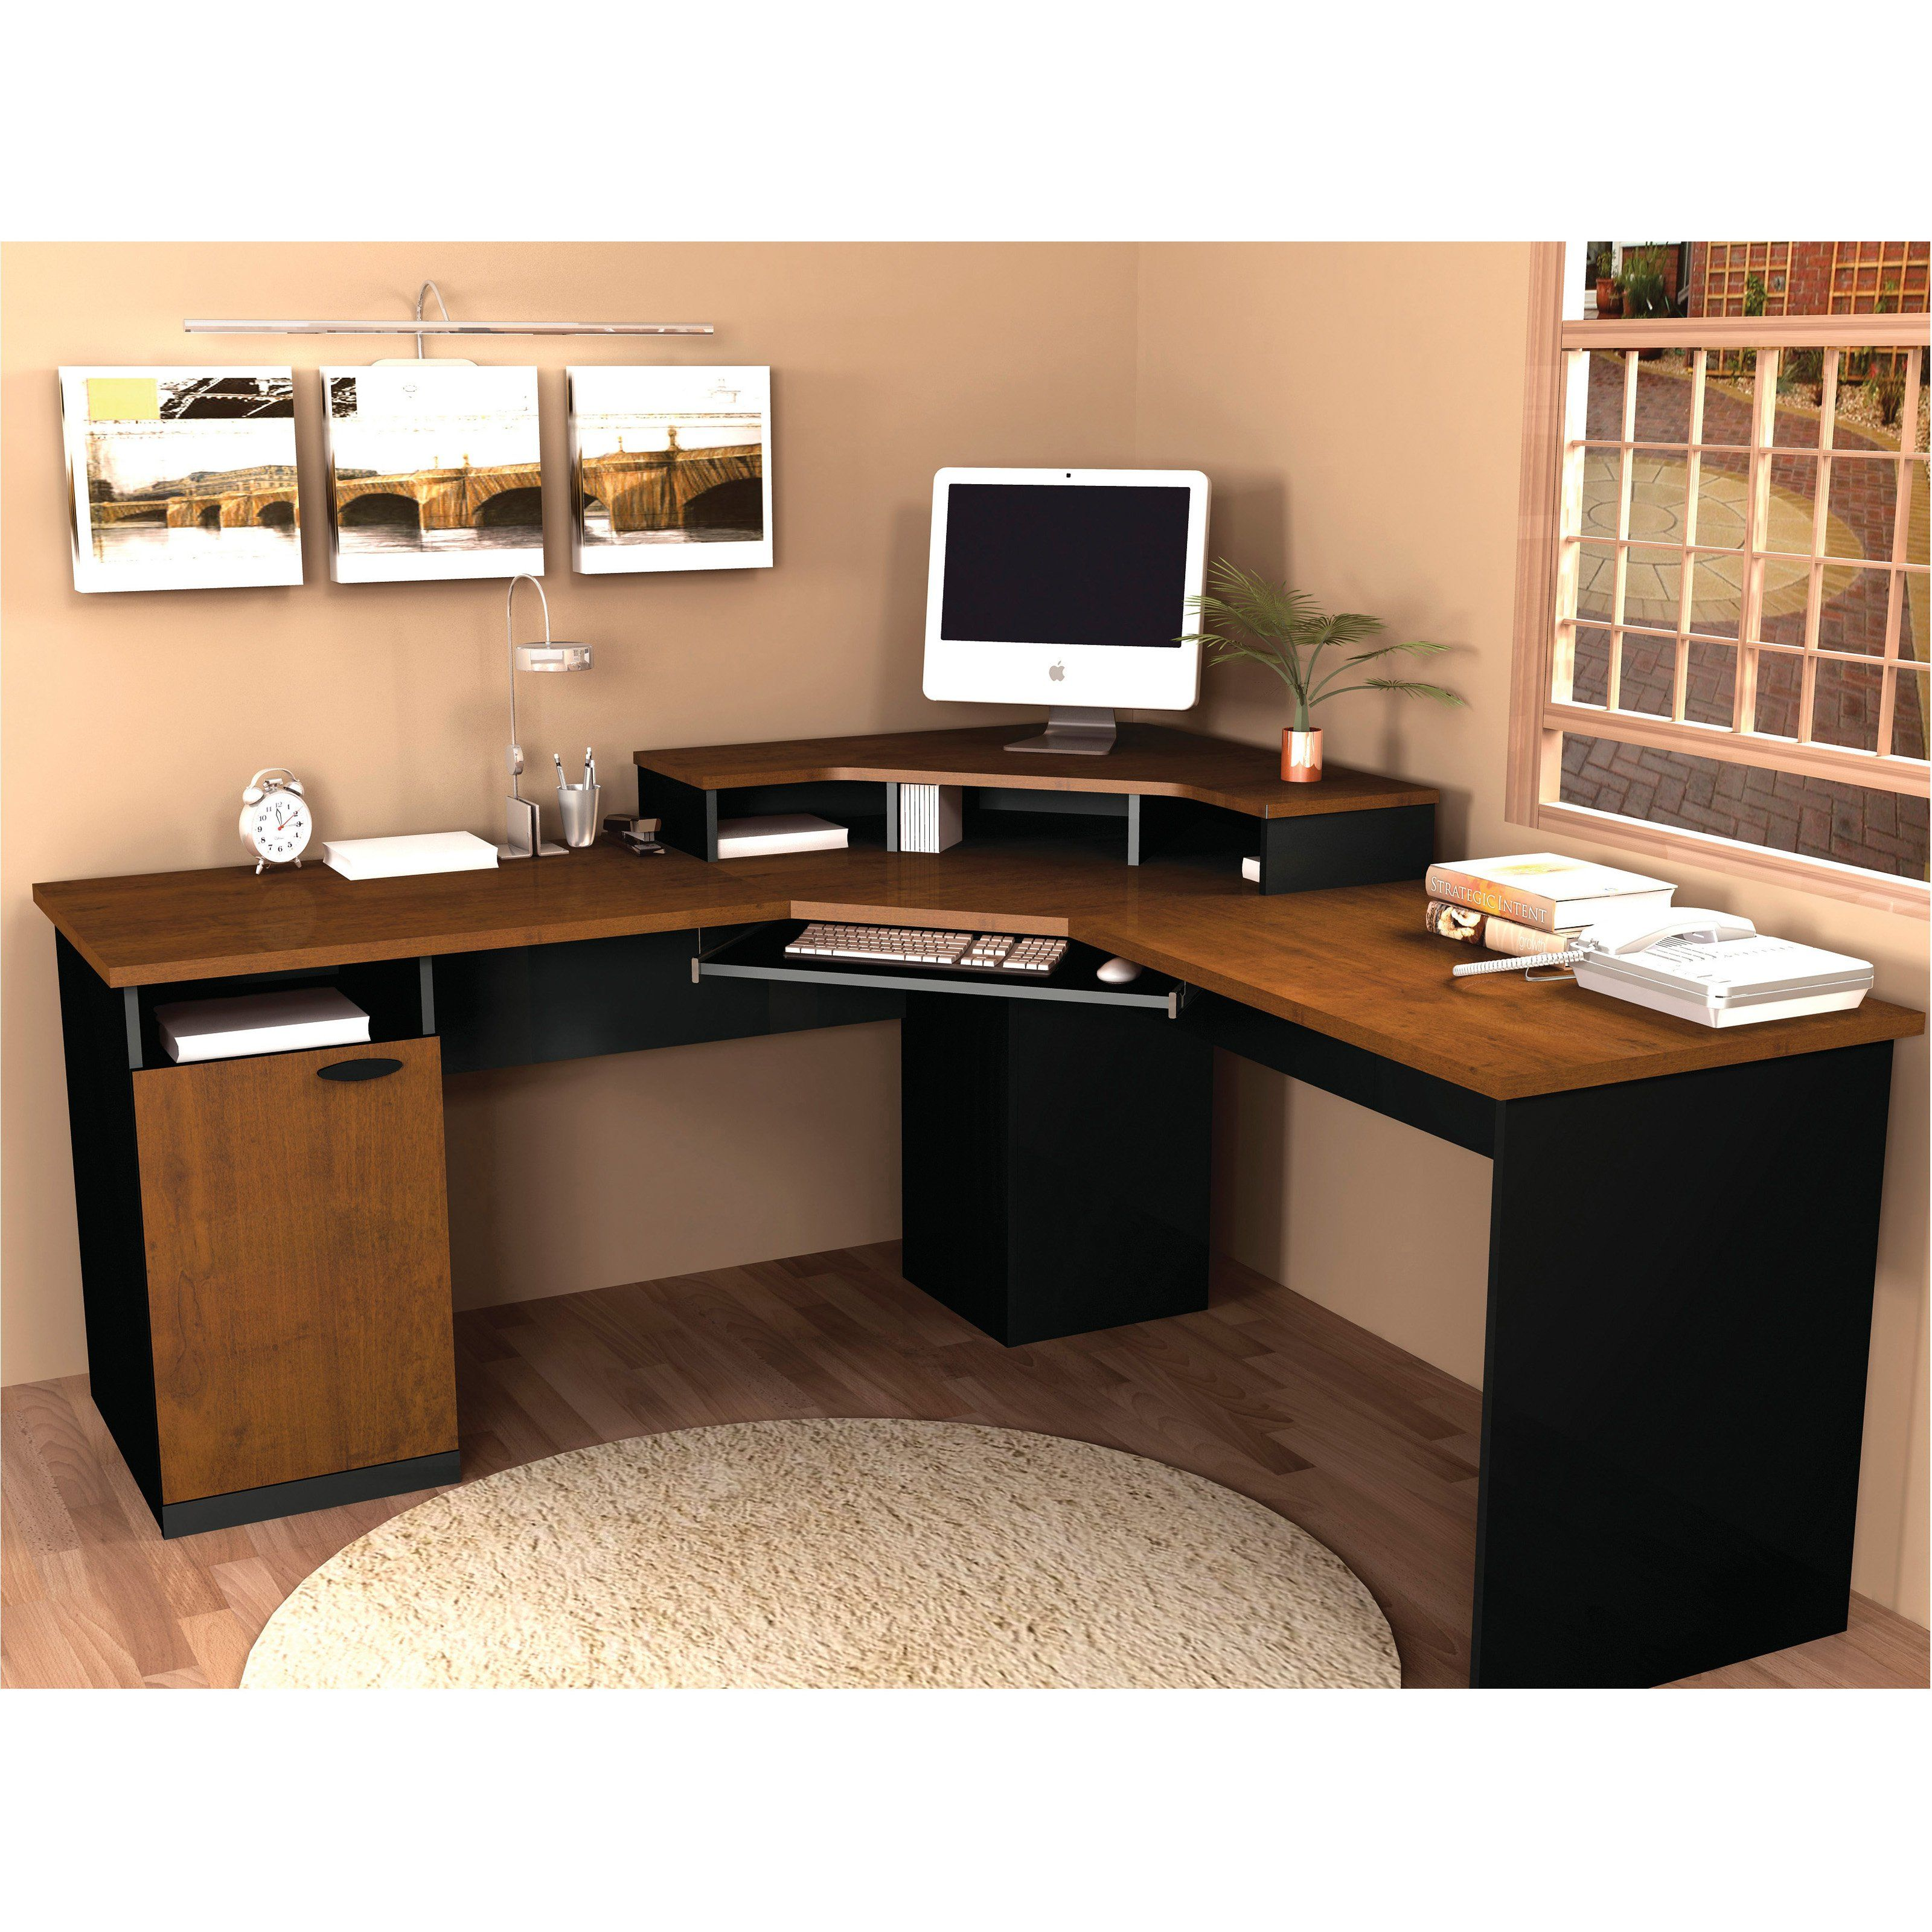 Bestar Hampton Corner Computer Desk - 69430-63 Desks Home Office